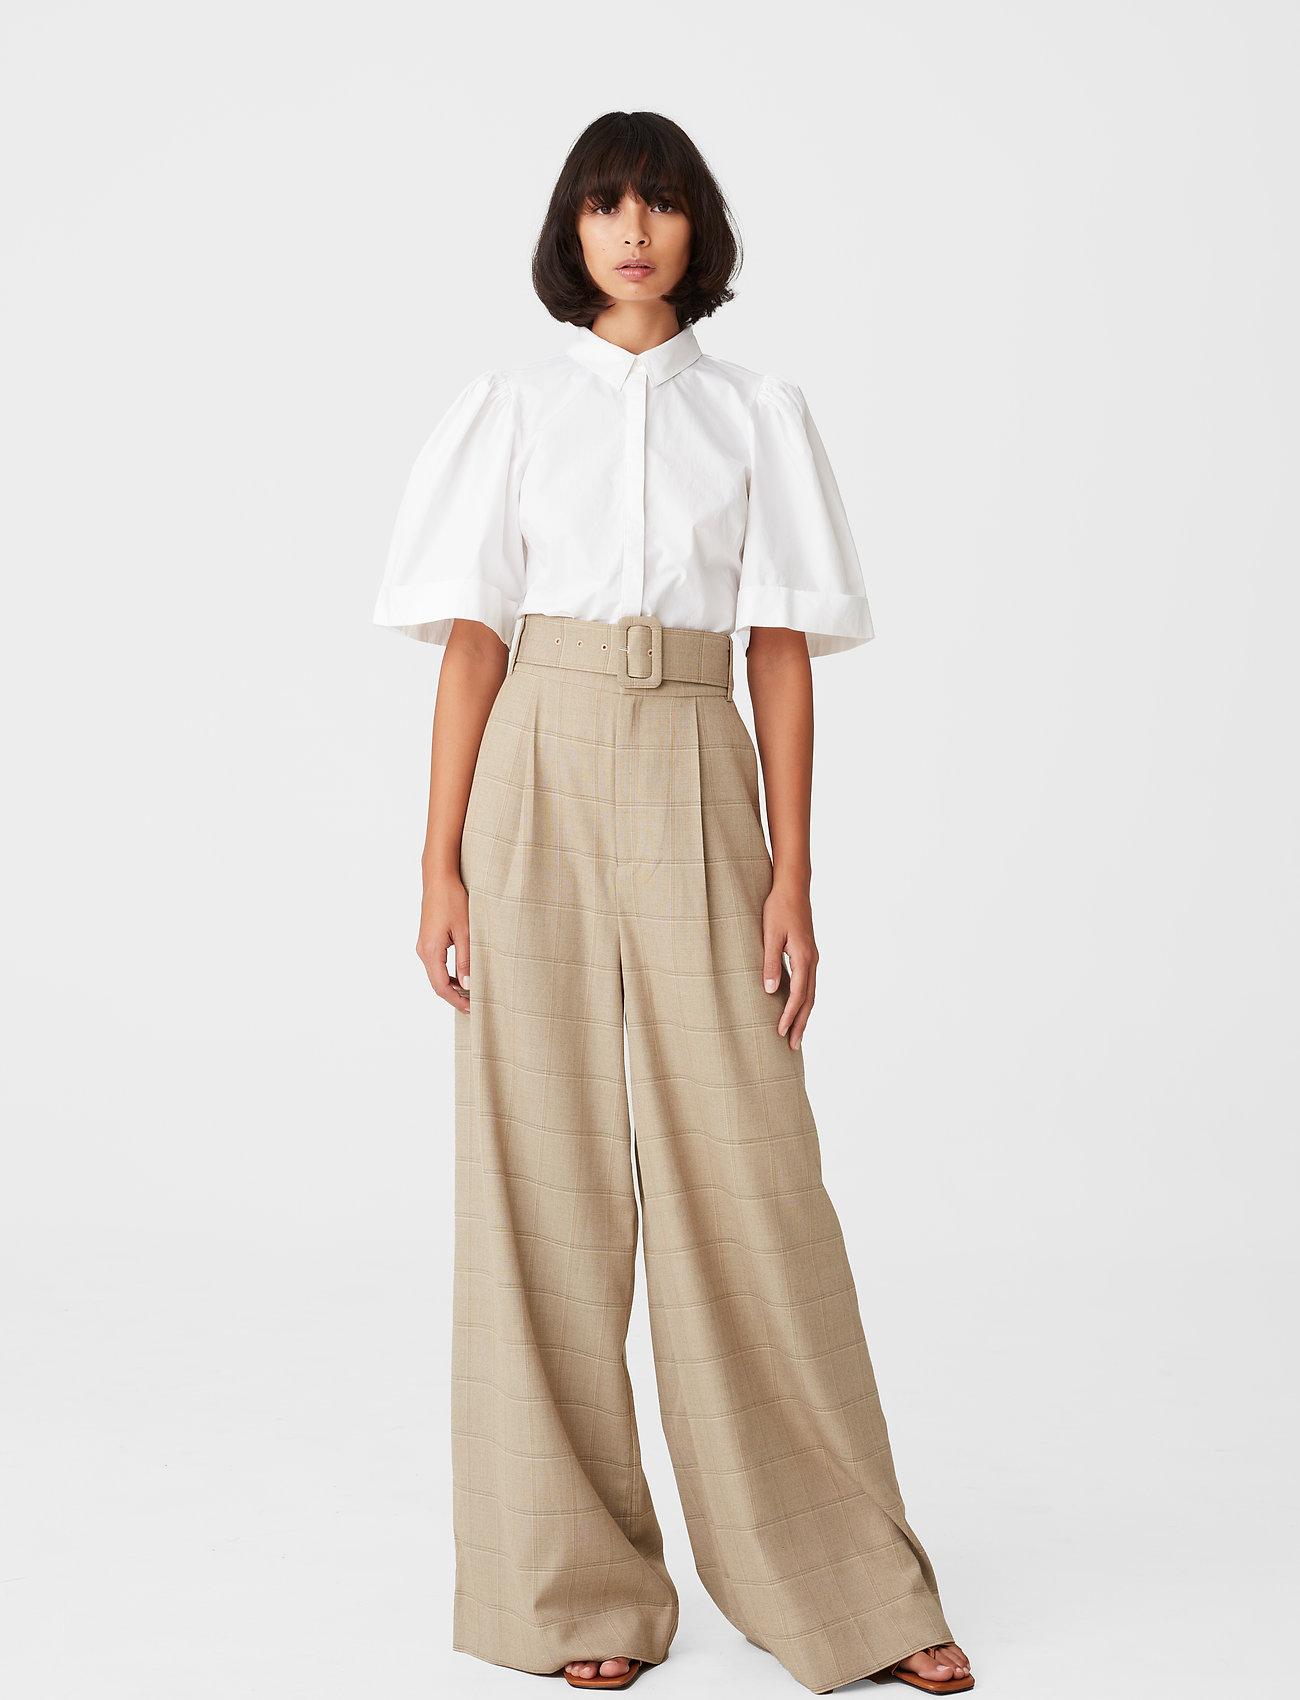 Gestuz - HalioGZ ss shirt - denimskjorter - bright white - 3